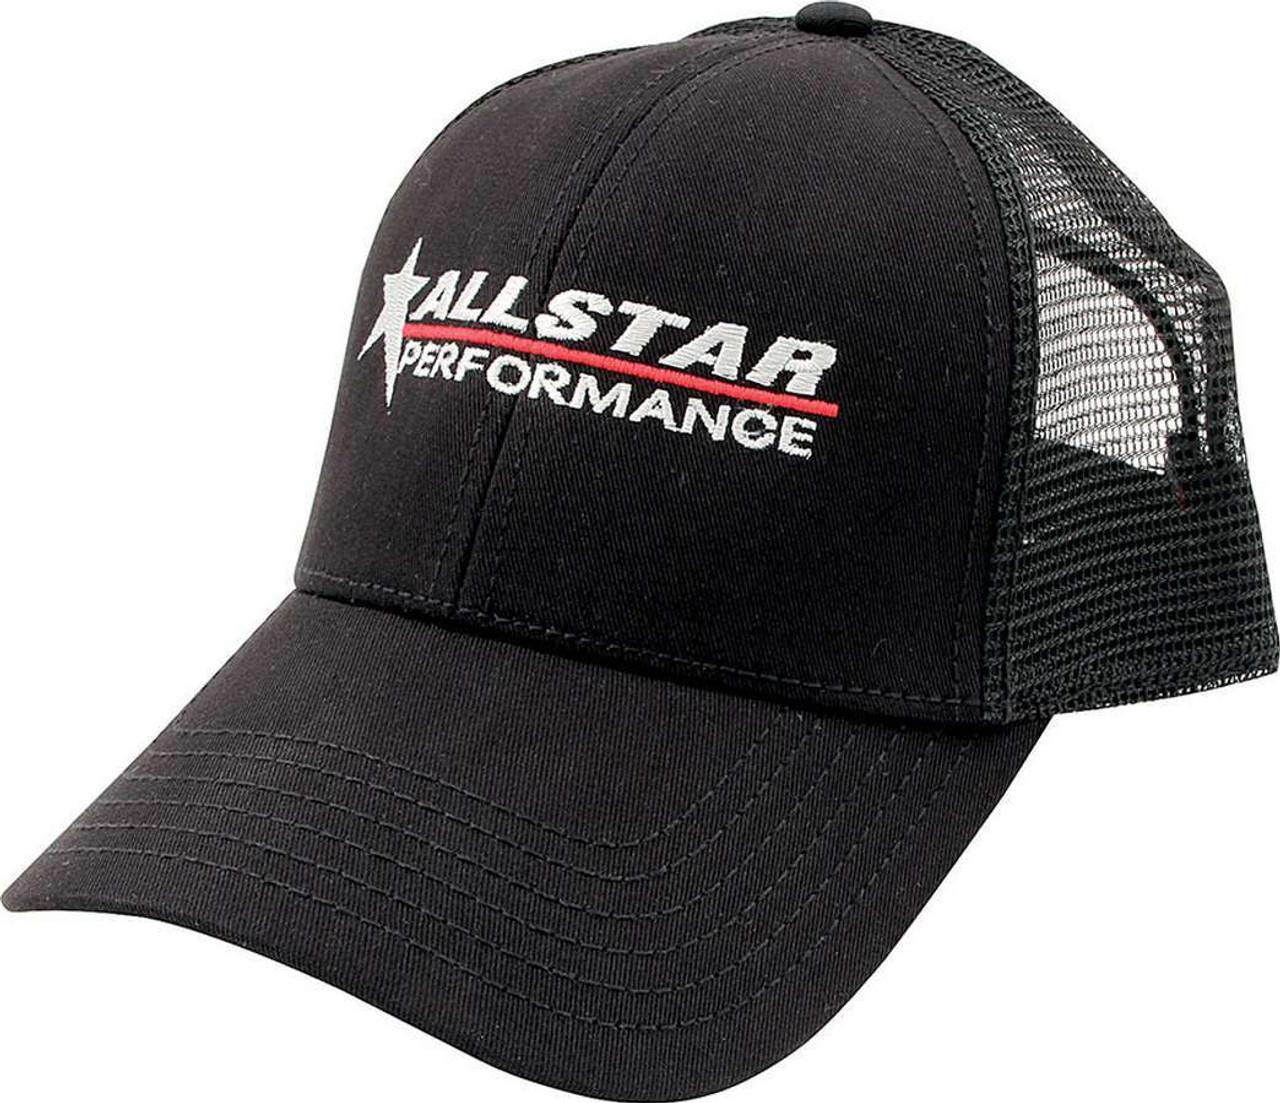 6a08a42421f Allstar Hat Black Mesh Back Velcro Closure ALL99957 Allstar Performance